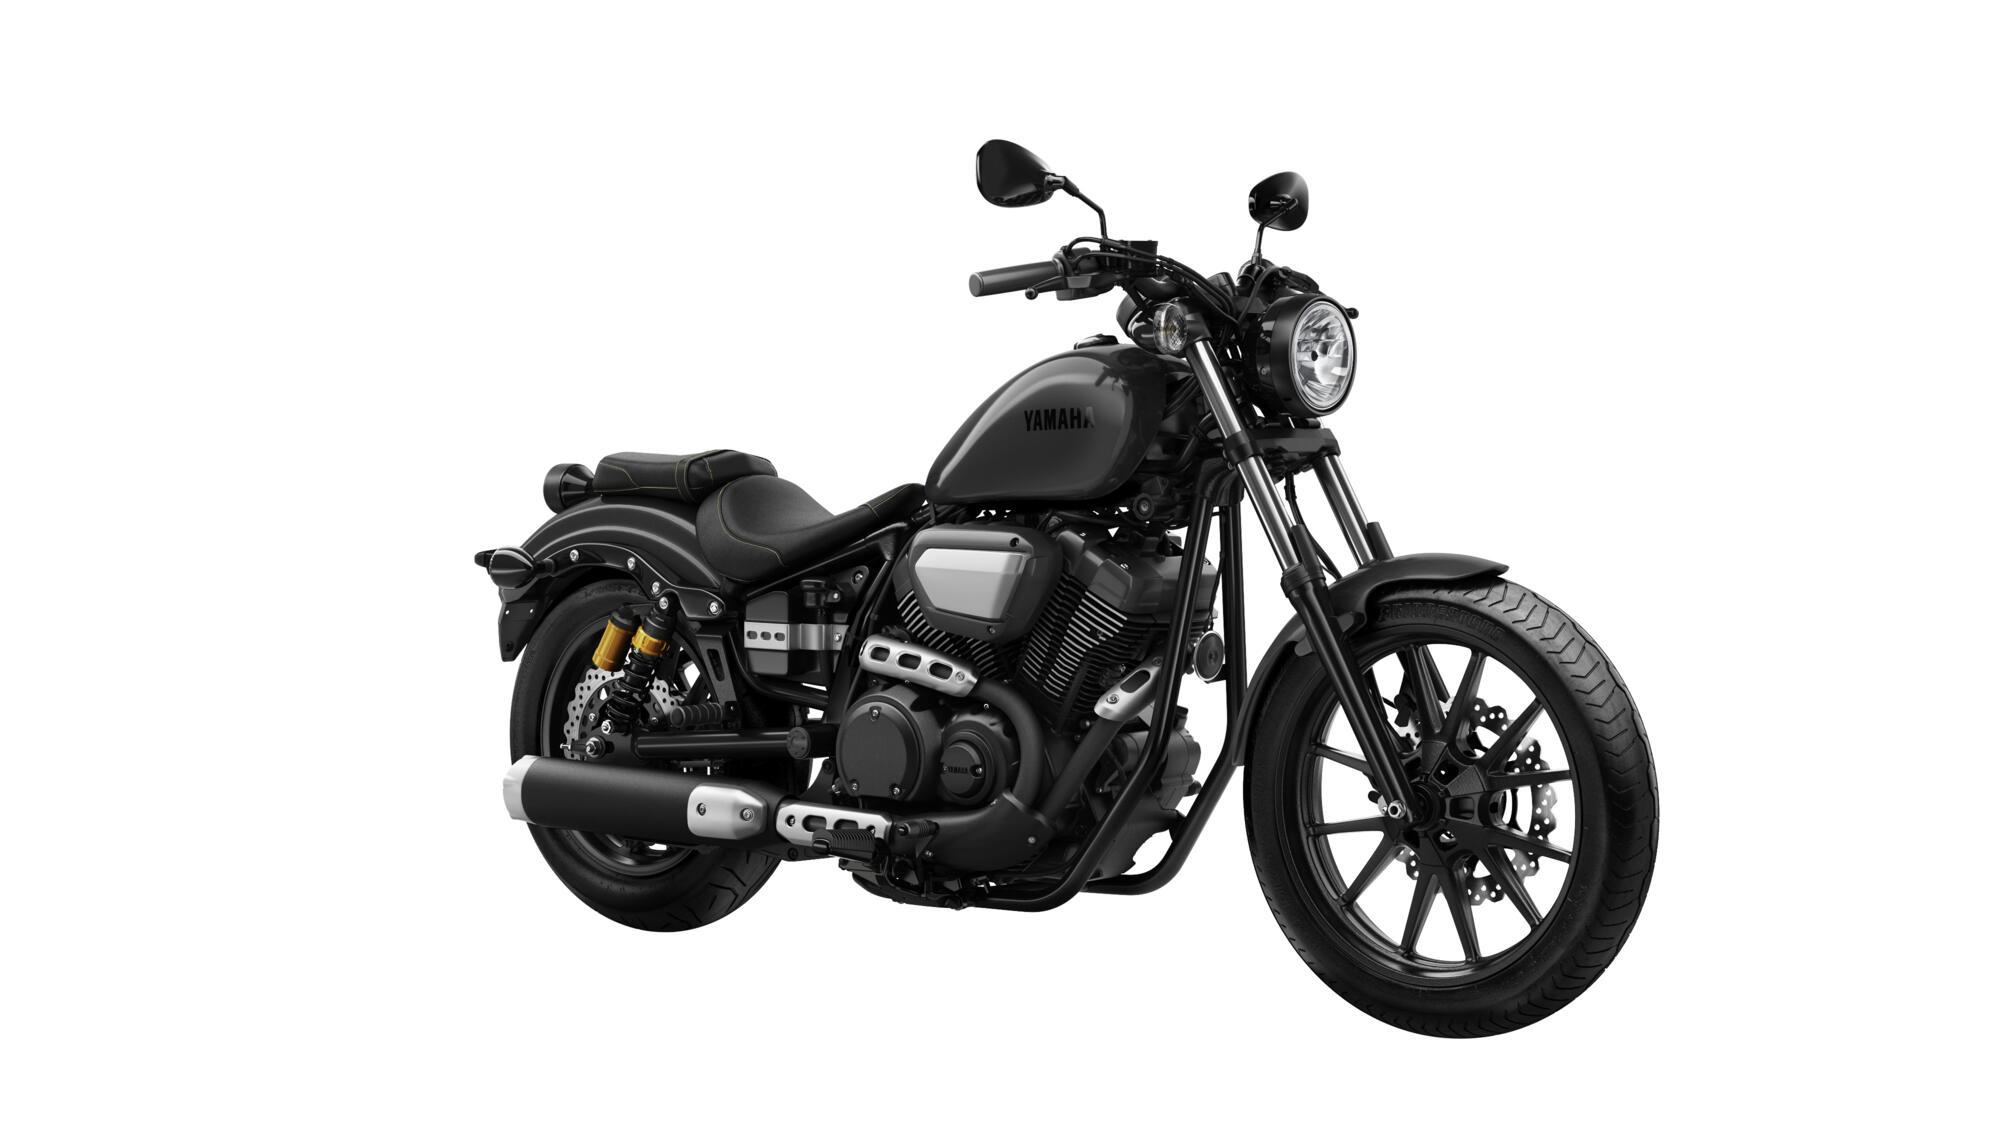 2017-Yamaha-XVS950CUASP-EU-Tech_Graphite-Studio-001-03